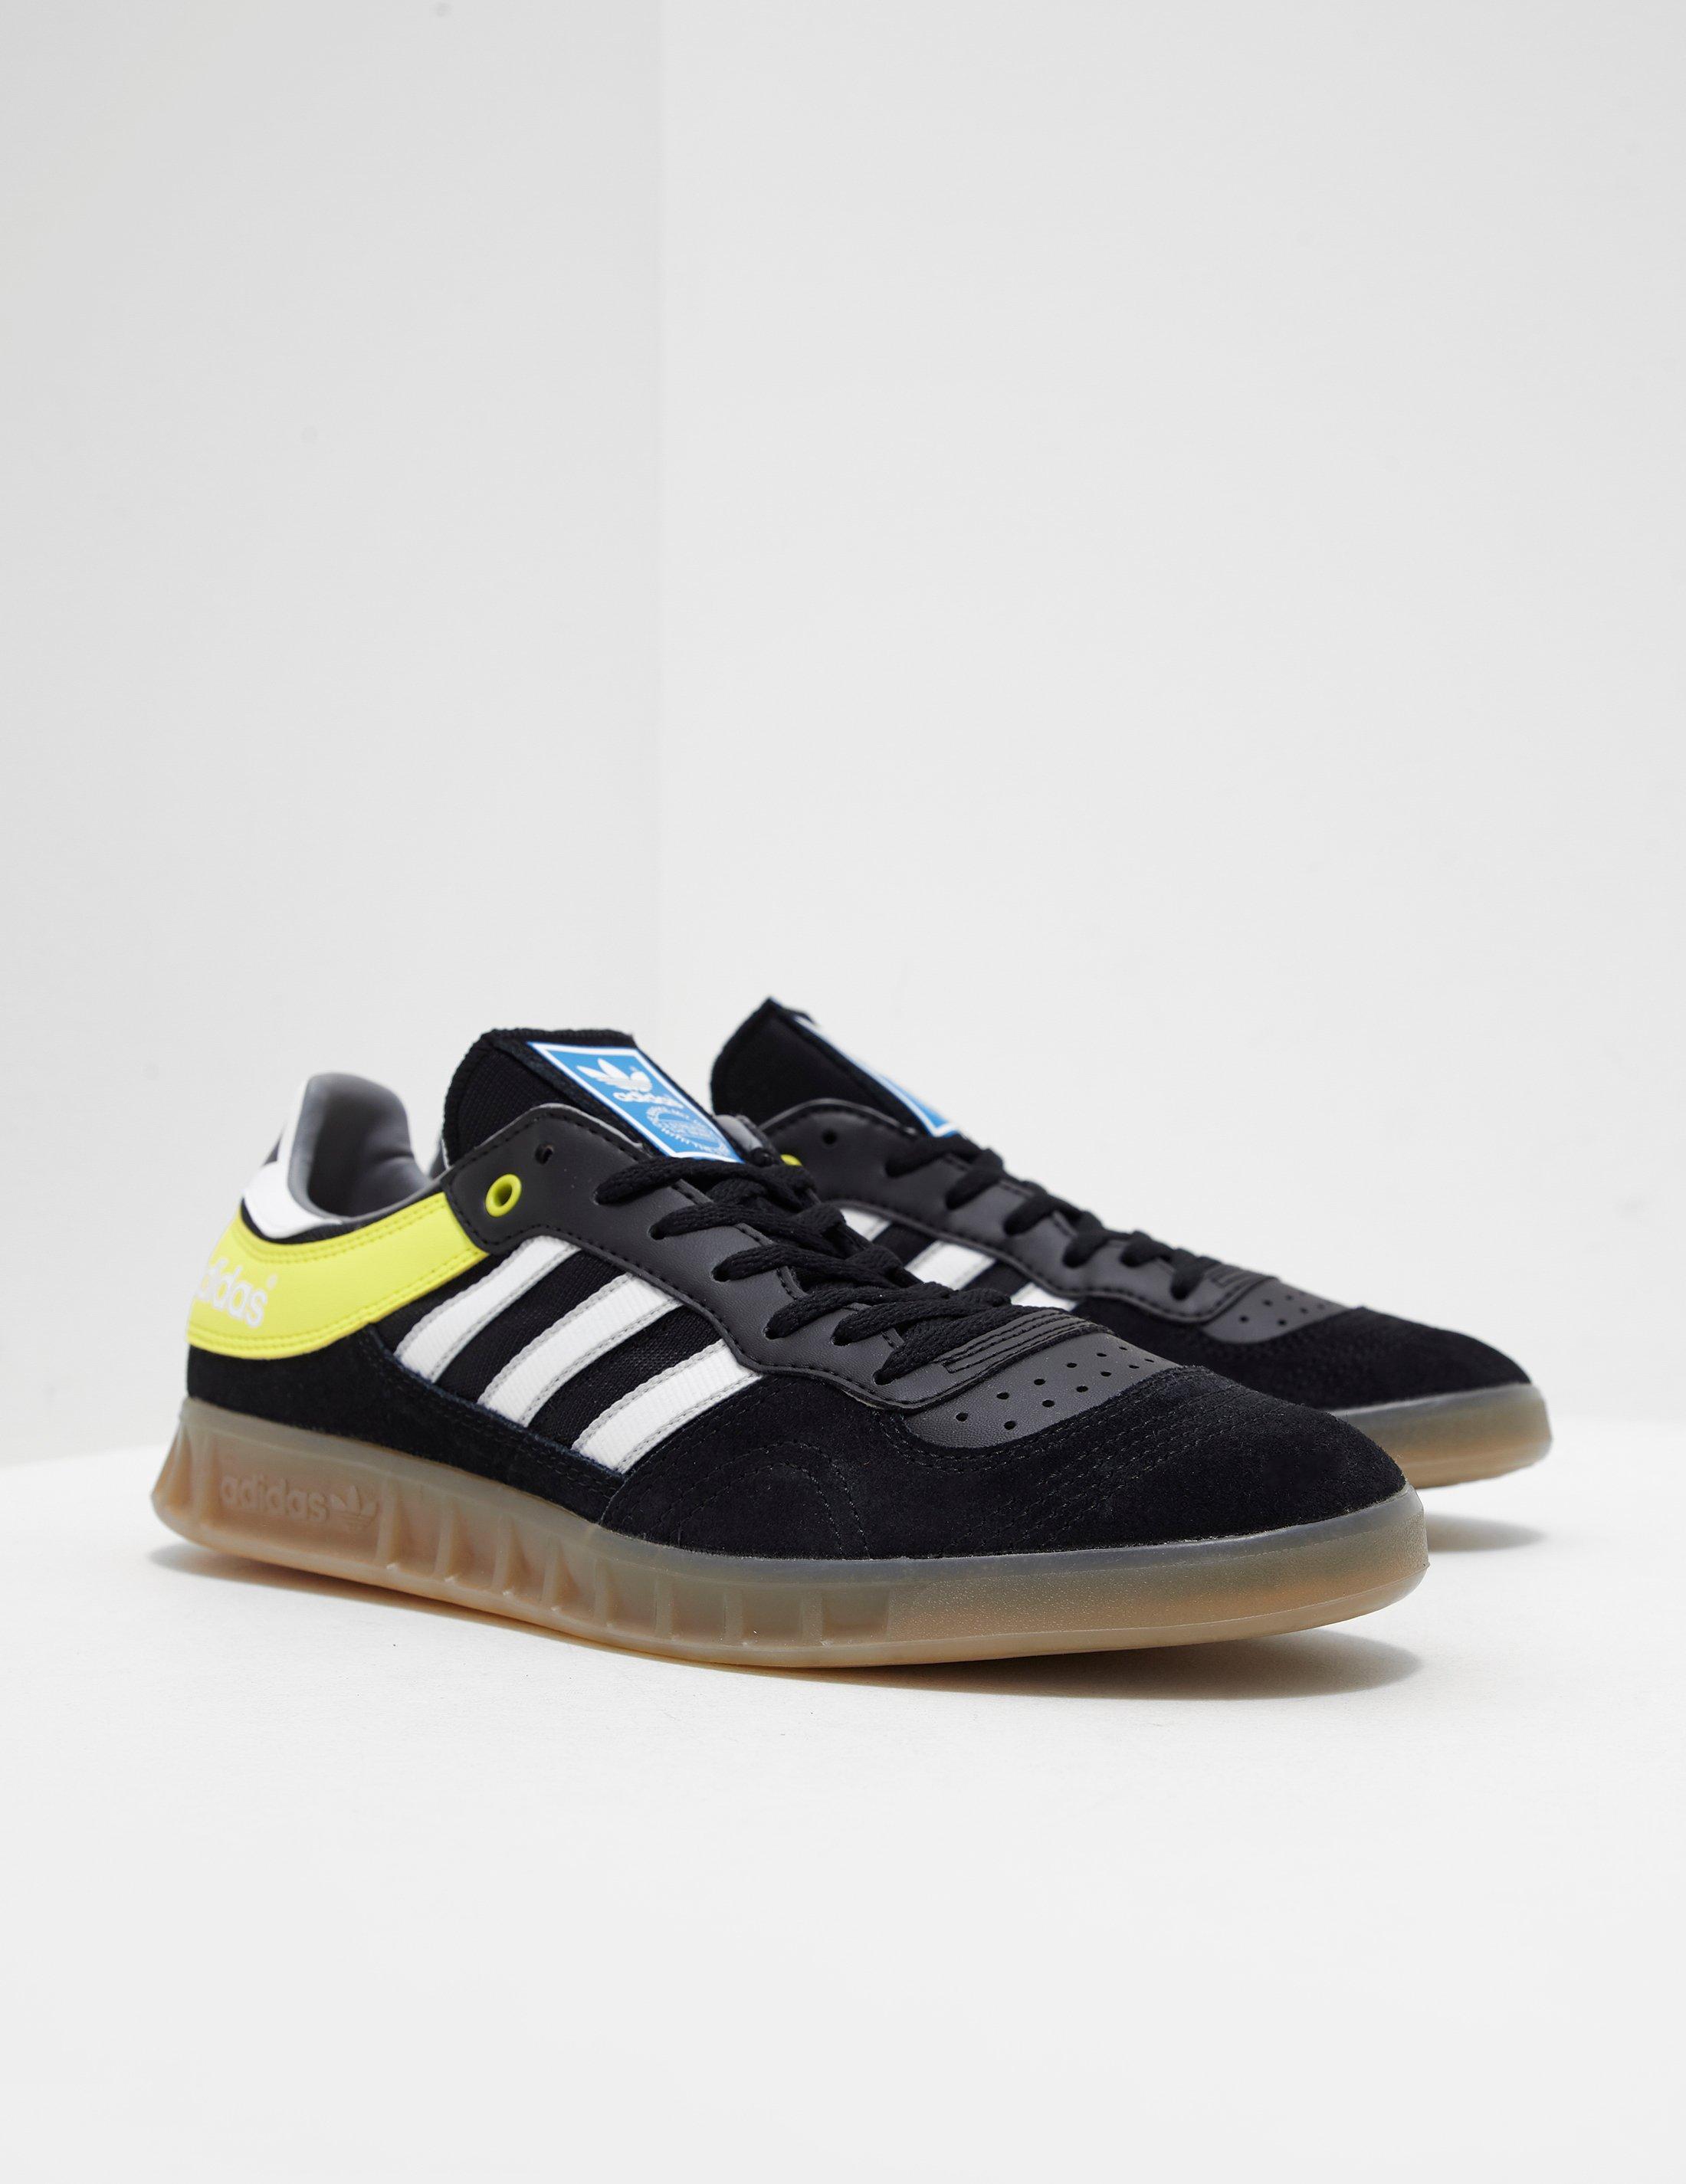 ad52c1c7b5b255 Lyst - Adidas Originals Mens Handball Top Black in Black for Men